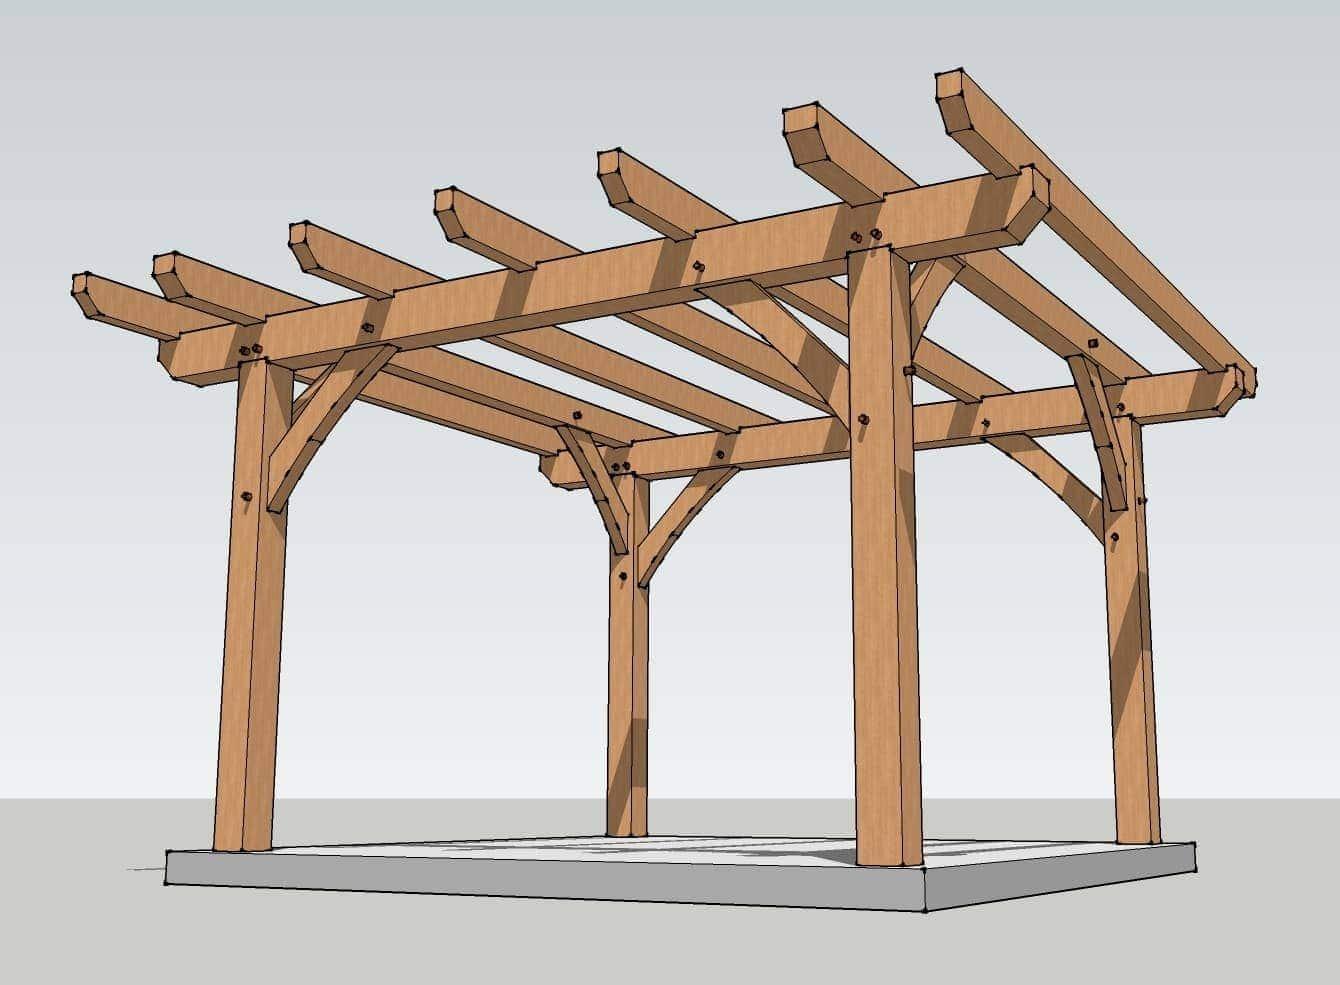 12x12 Timber Frame Pergola Plan - Timber Frame HQ